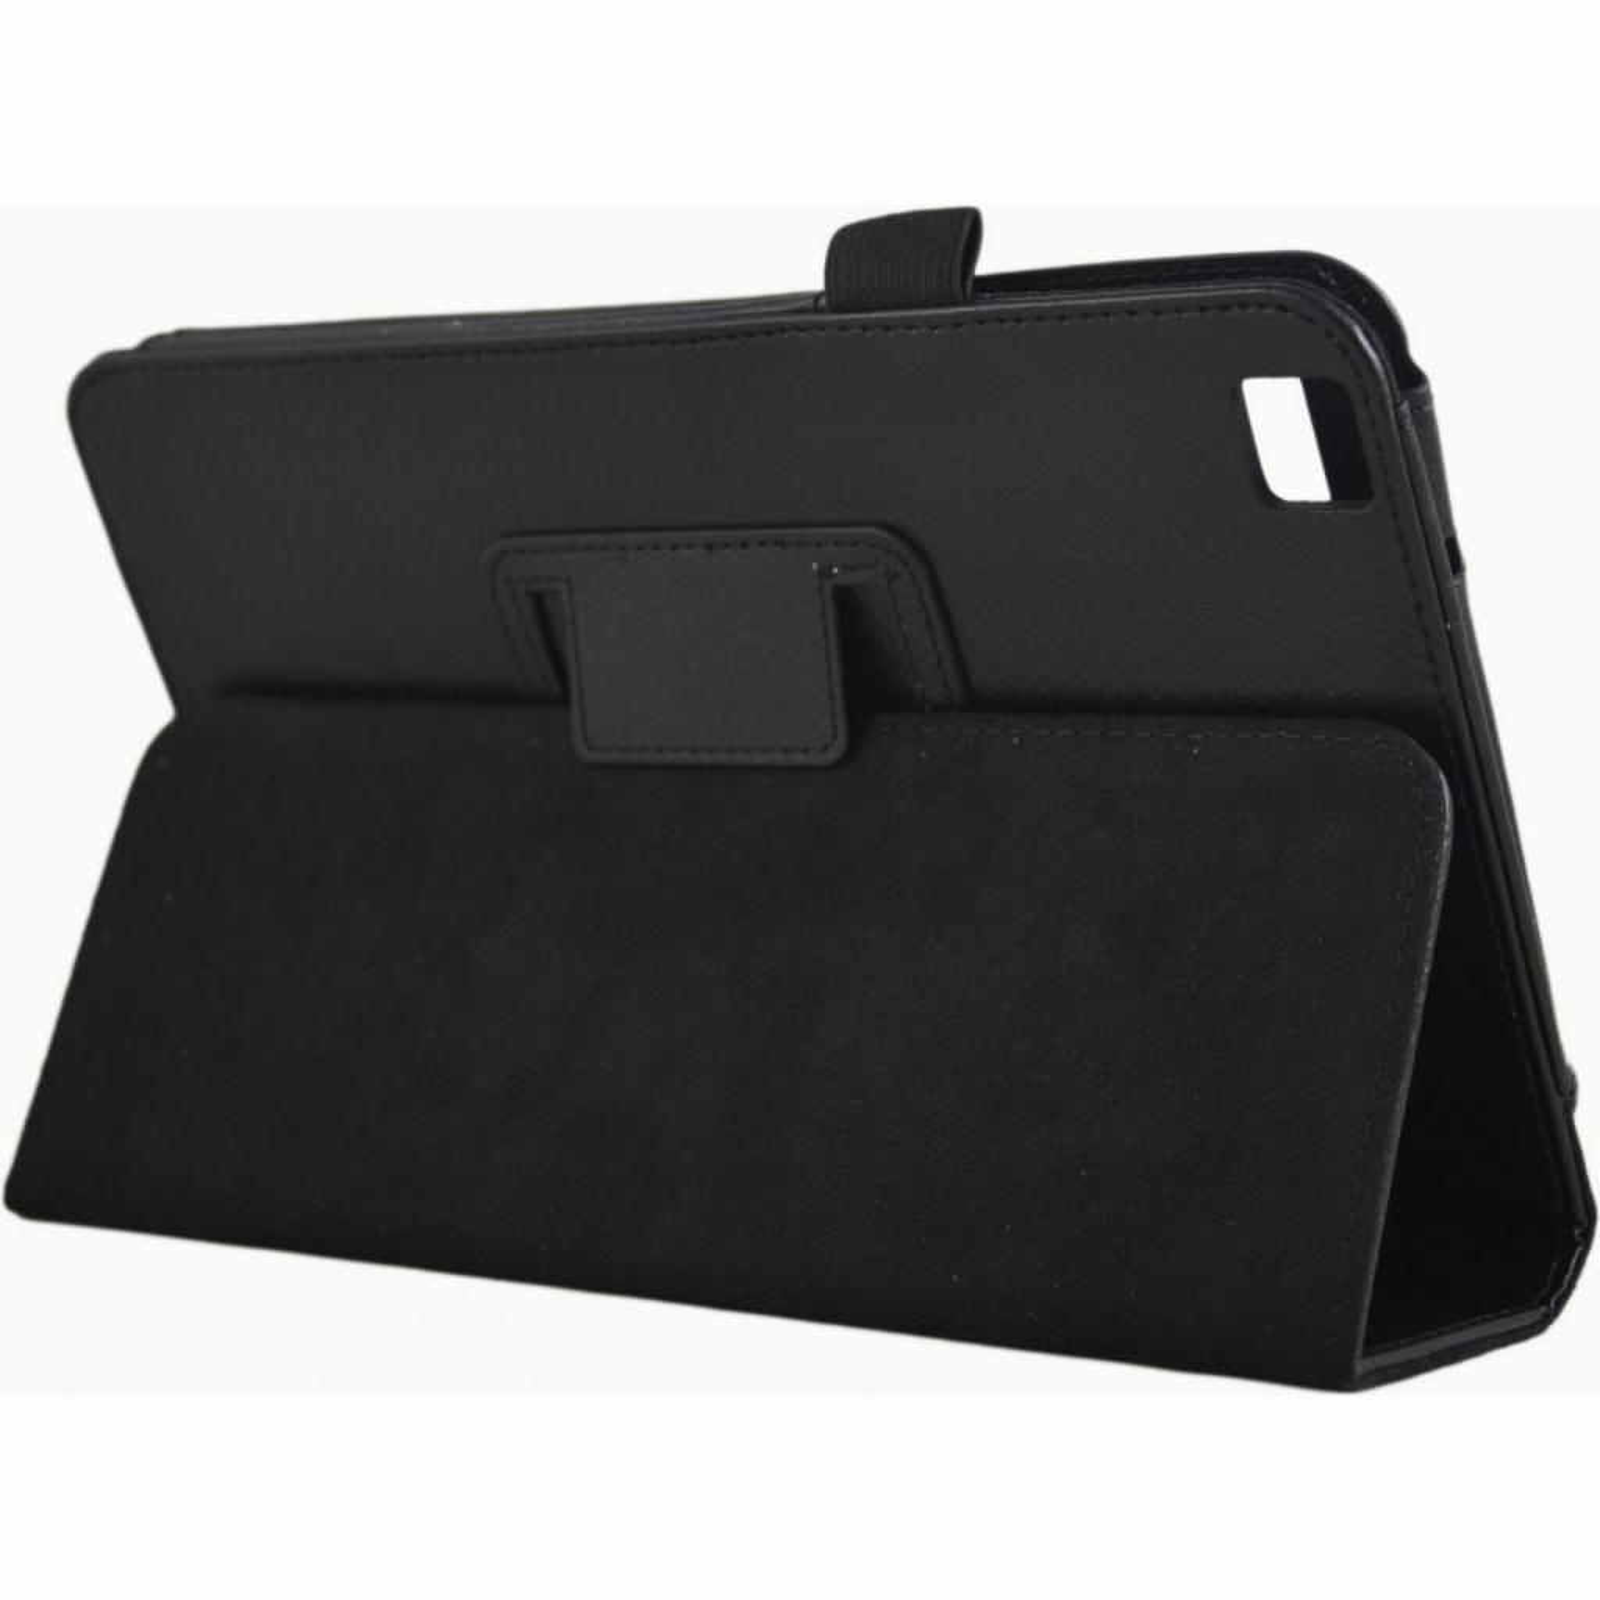 "Чехол для планшета Pro-case 8"" Pro-case Galaxy Tab 3 T3100 8"" (Tab 3 T3100) изображение 3"